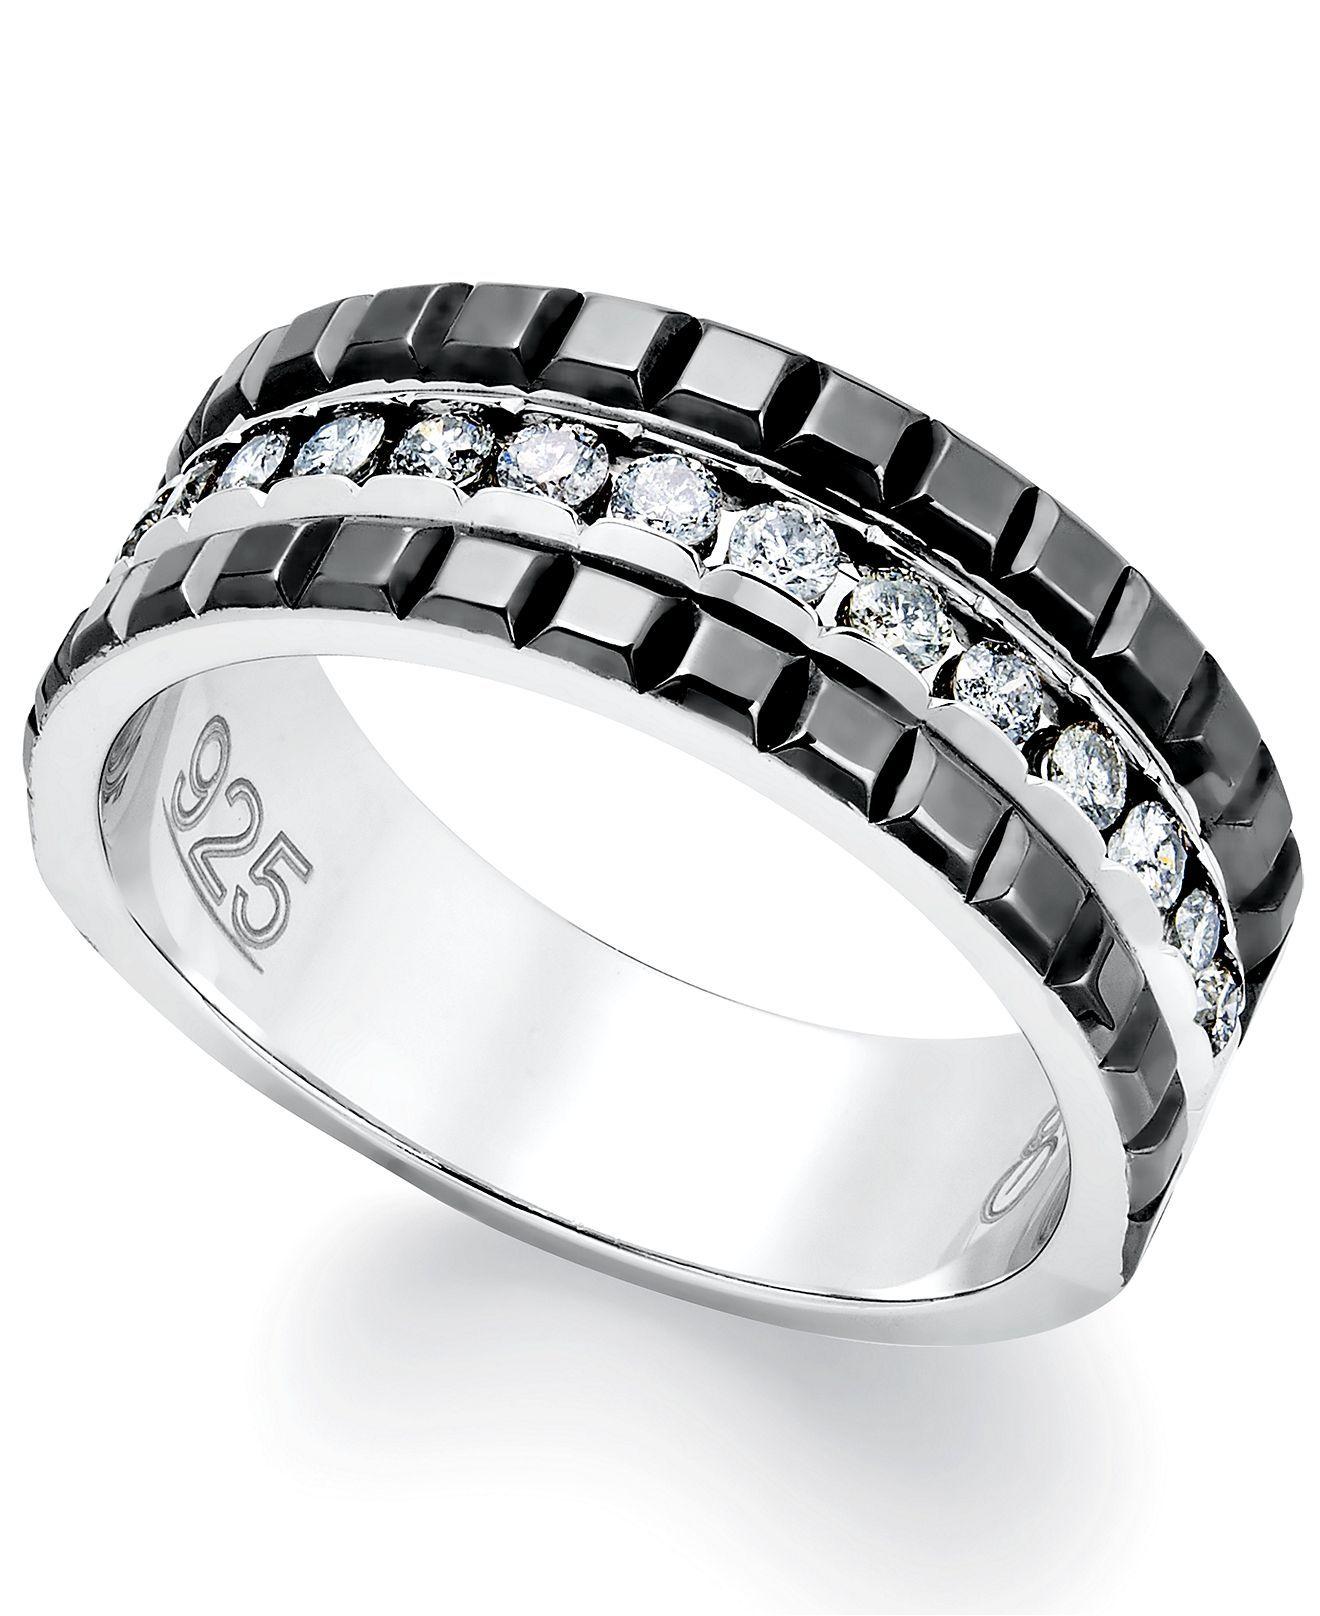 Mens Diamond Ring, Sterling Silver and 2Row Black Enamel